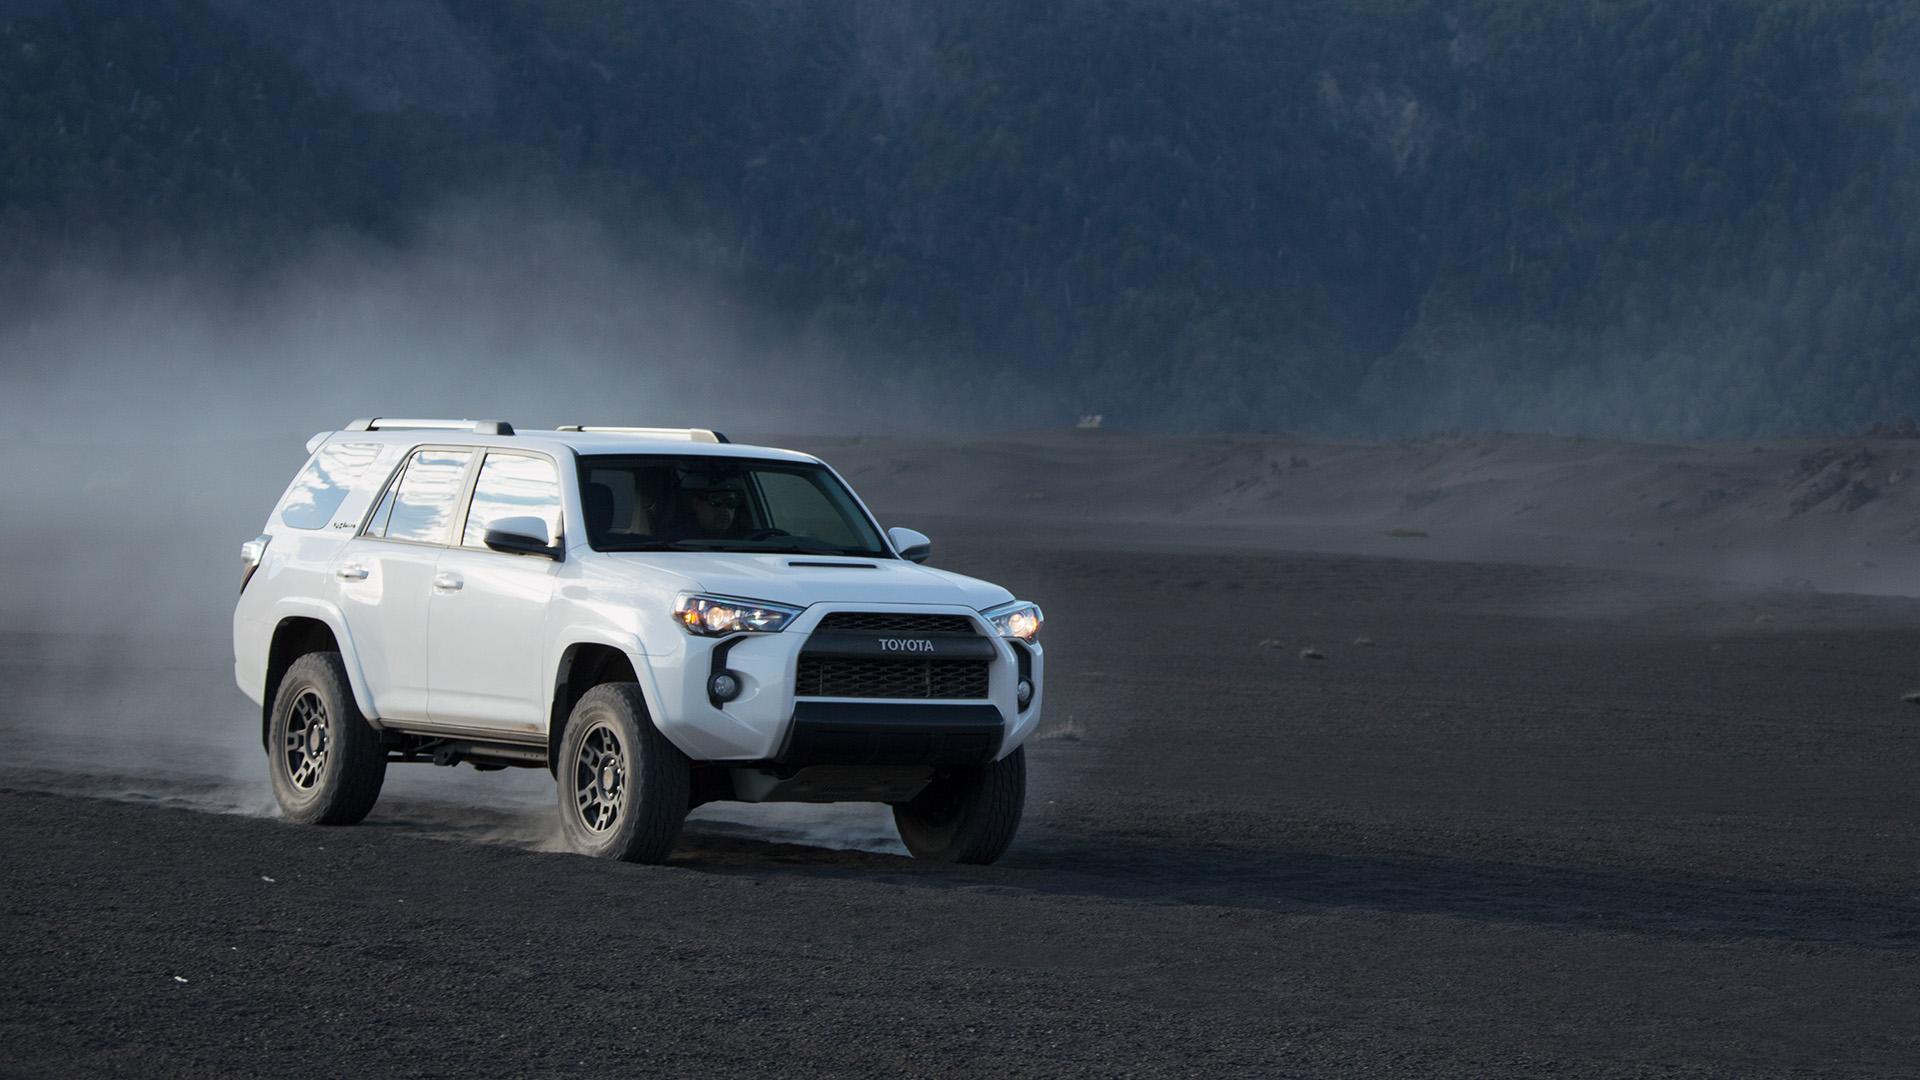 Toyota 4runner Wallpapers Wallpaper Cave